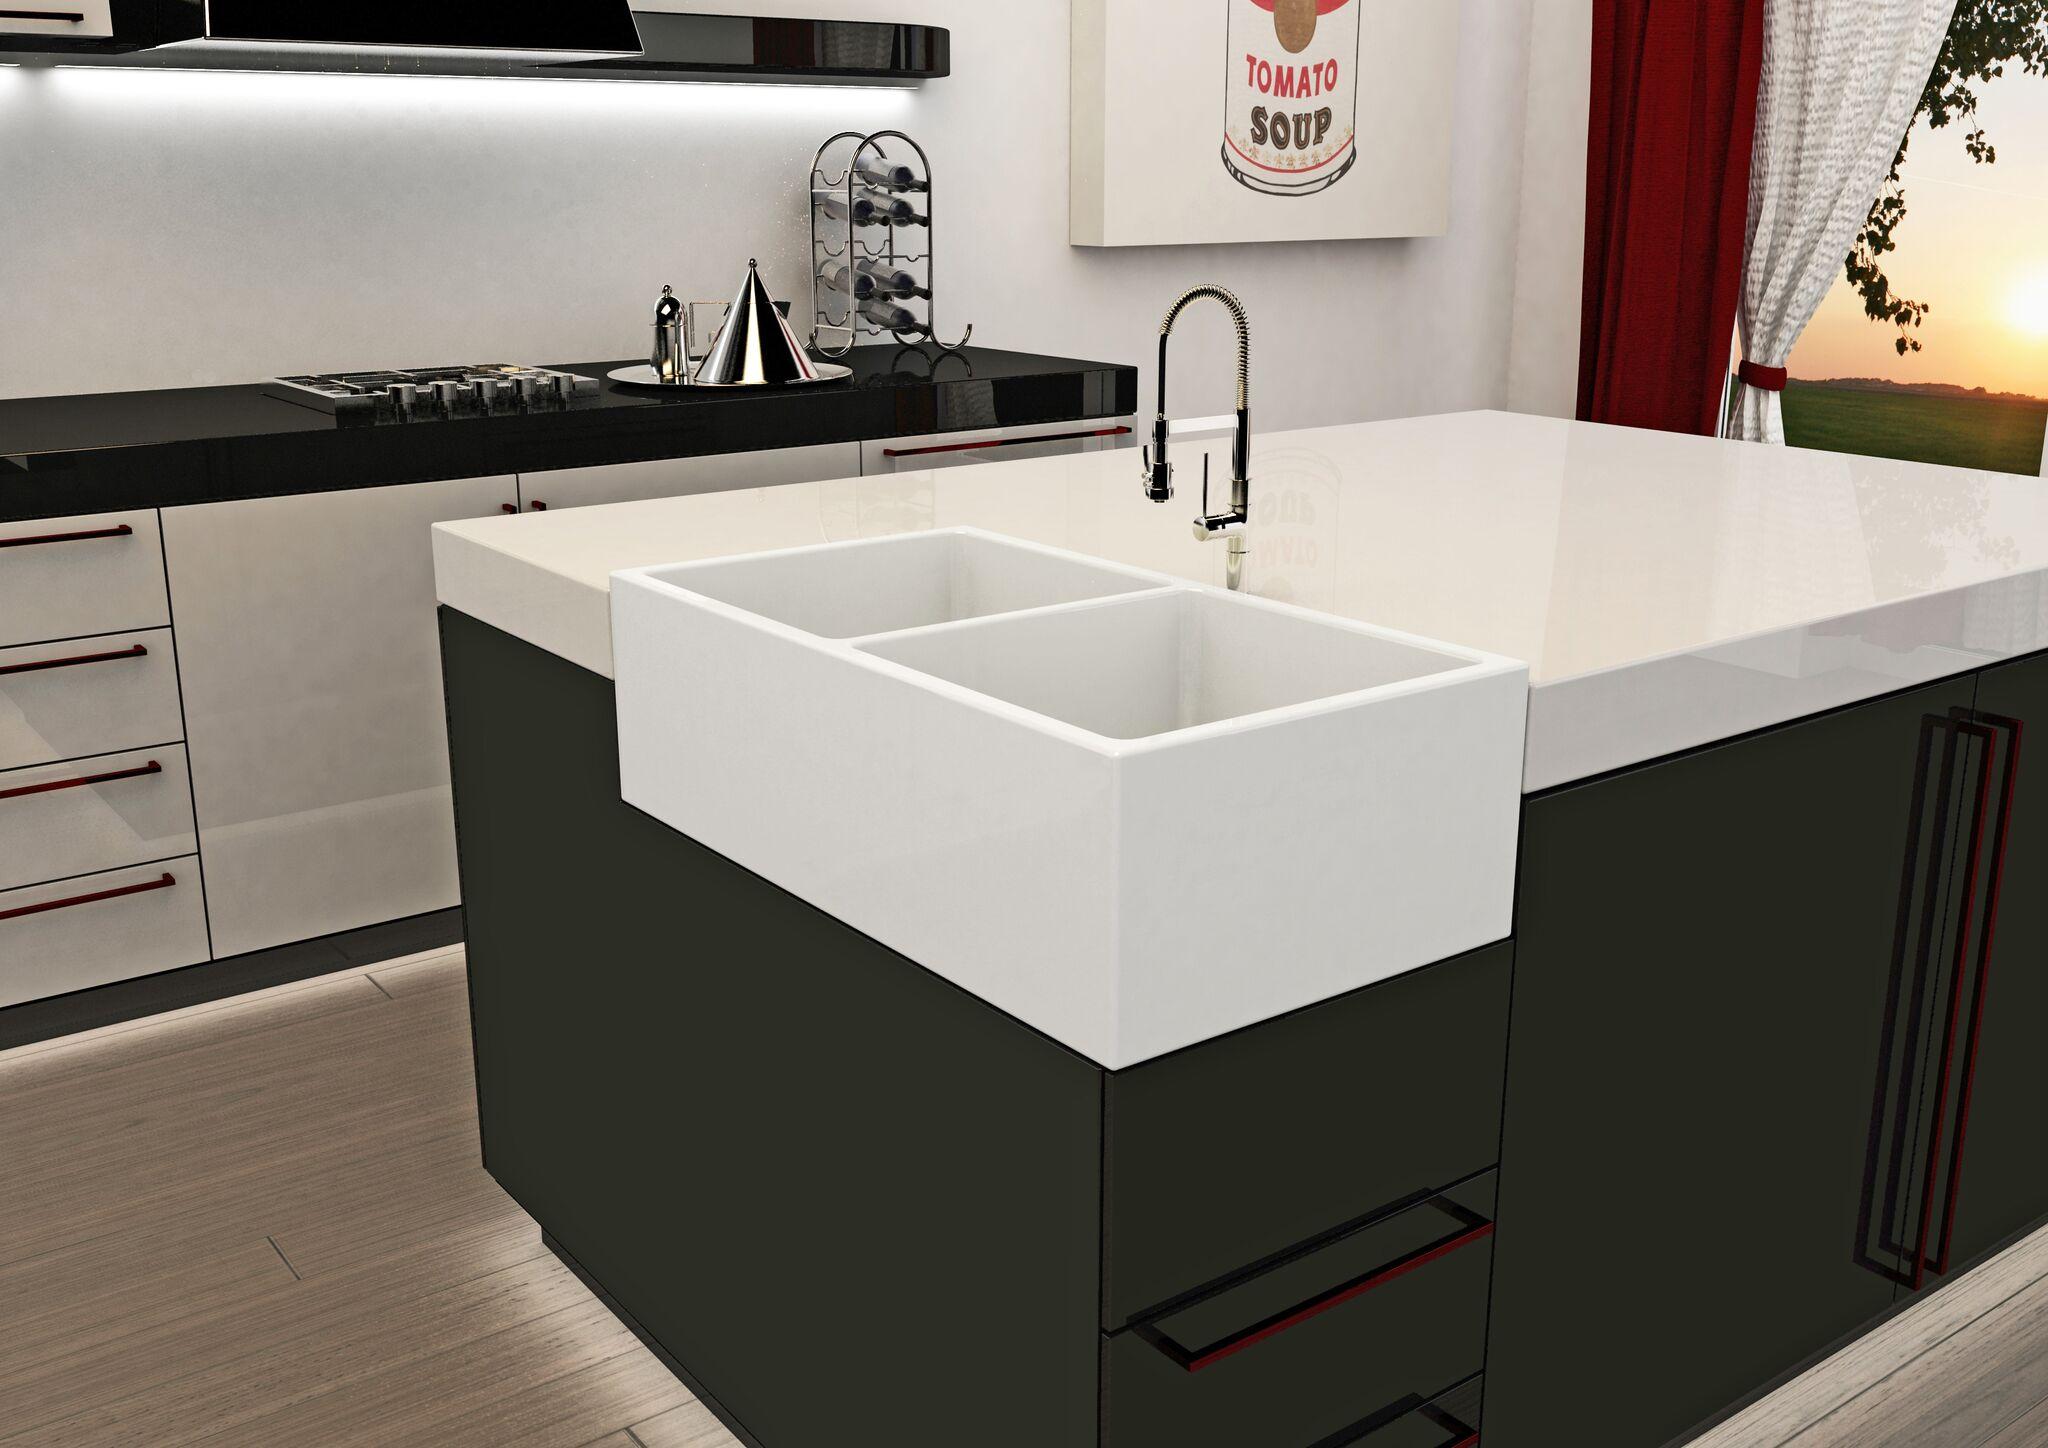 3rings | Cool Corner Kitchen Sink from Ruvati — 3rings